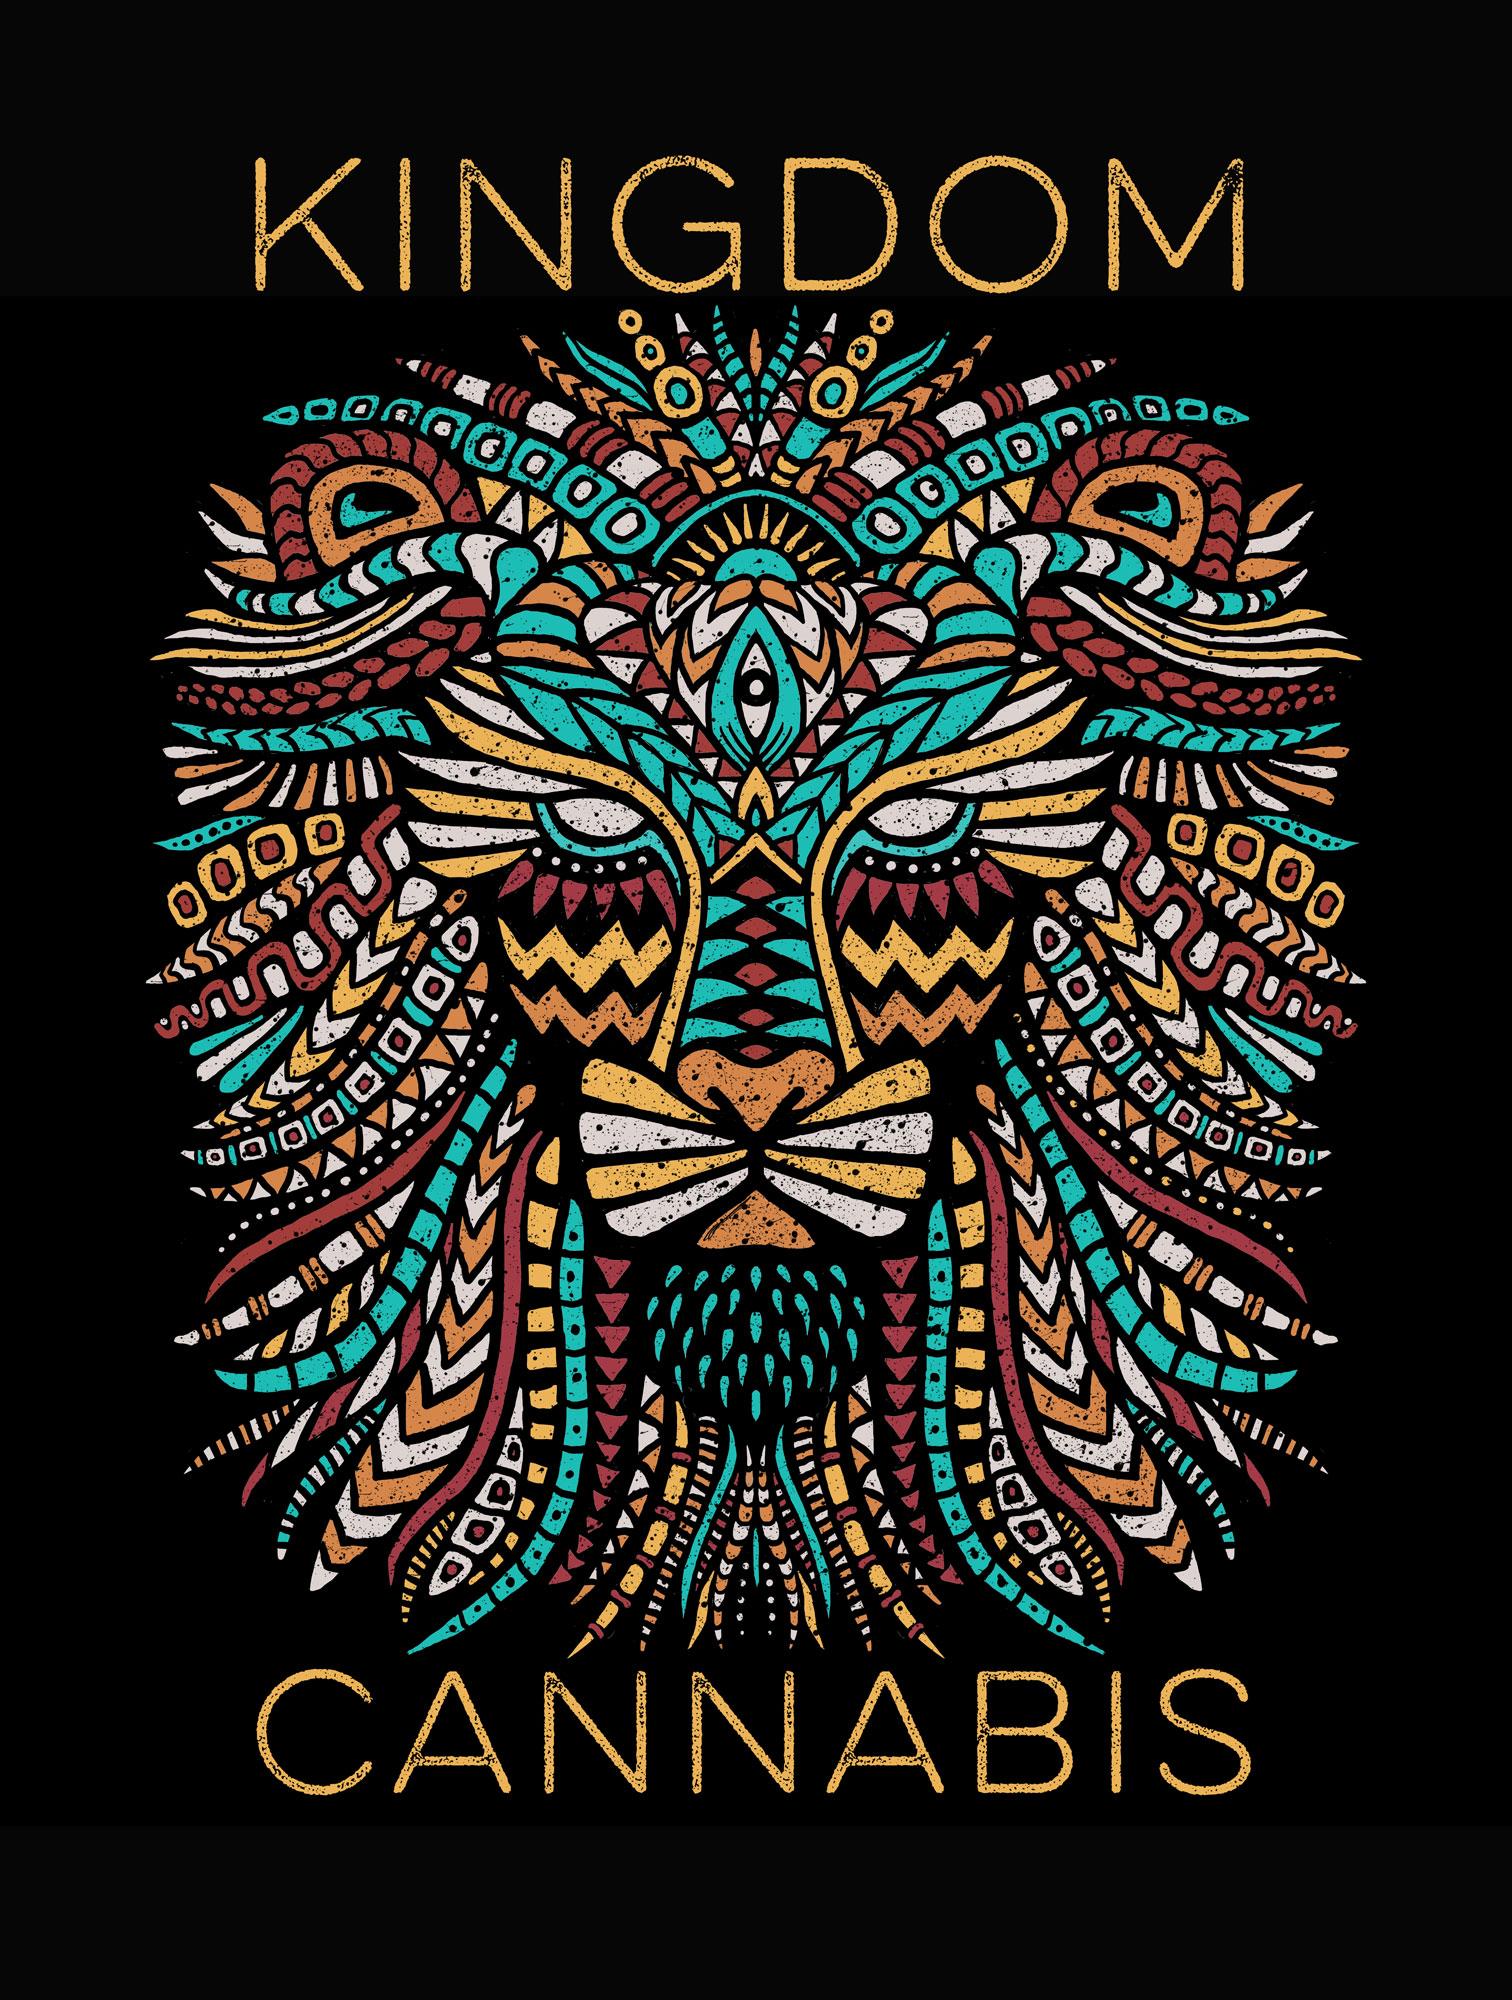 KINGDOM CANNABIS